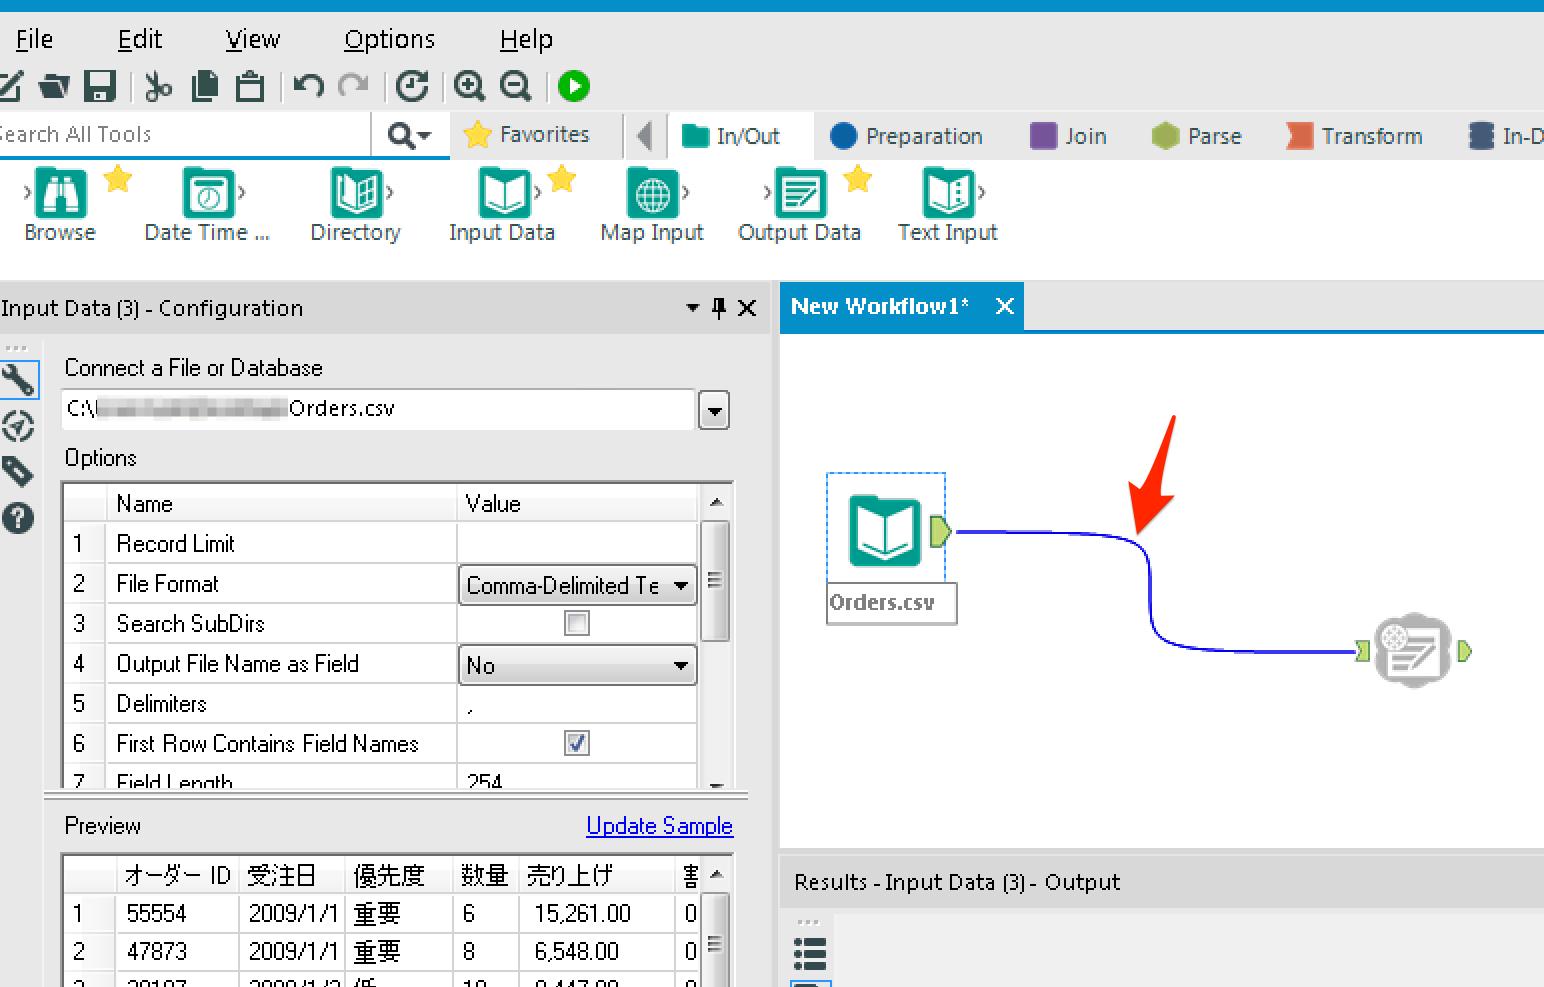 alteryx-workflow-tableau-server-publish_061